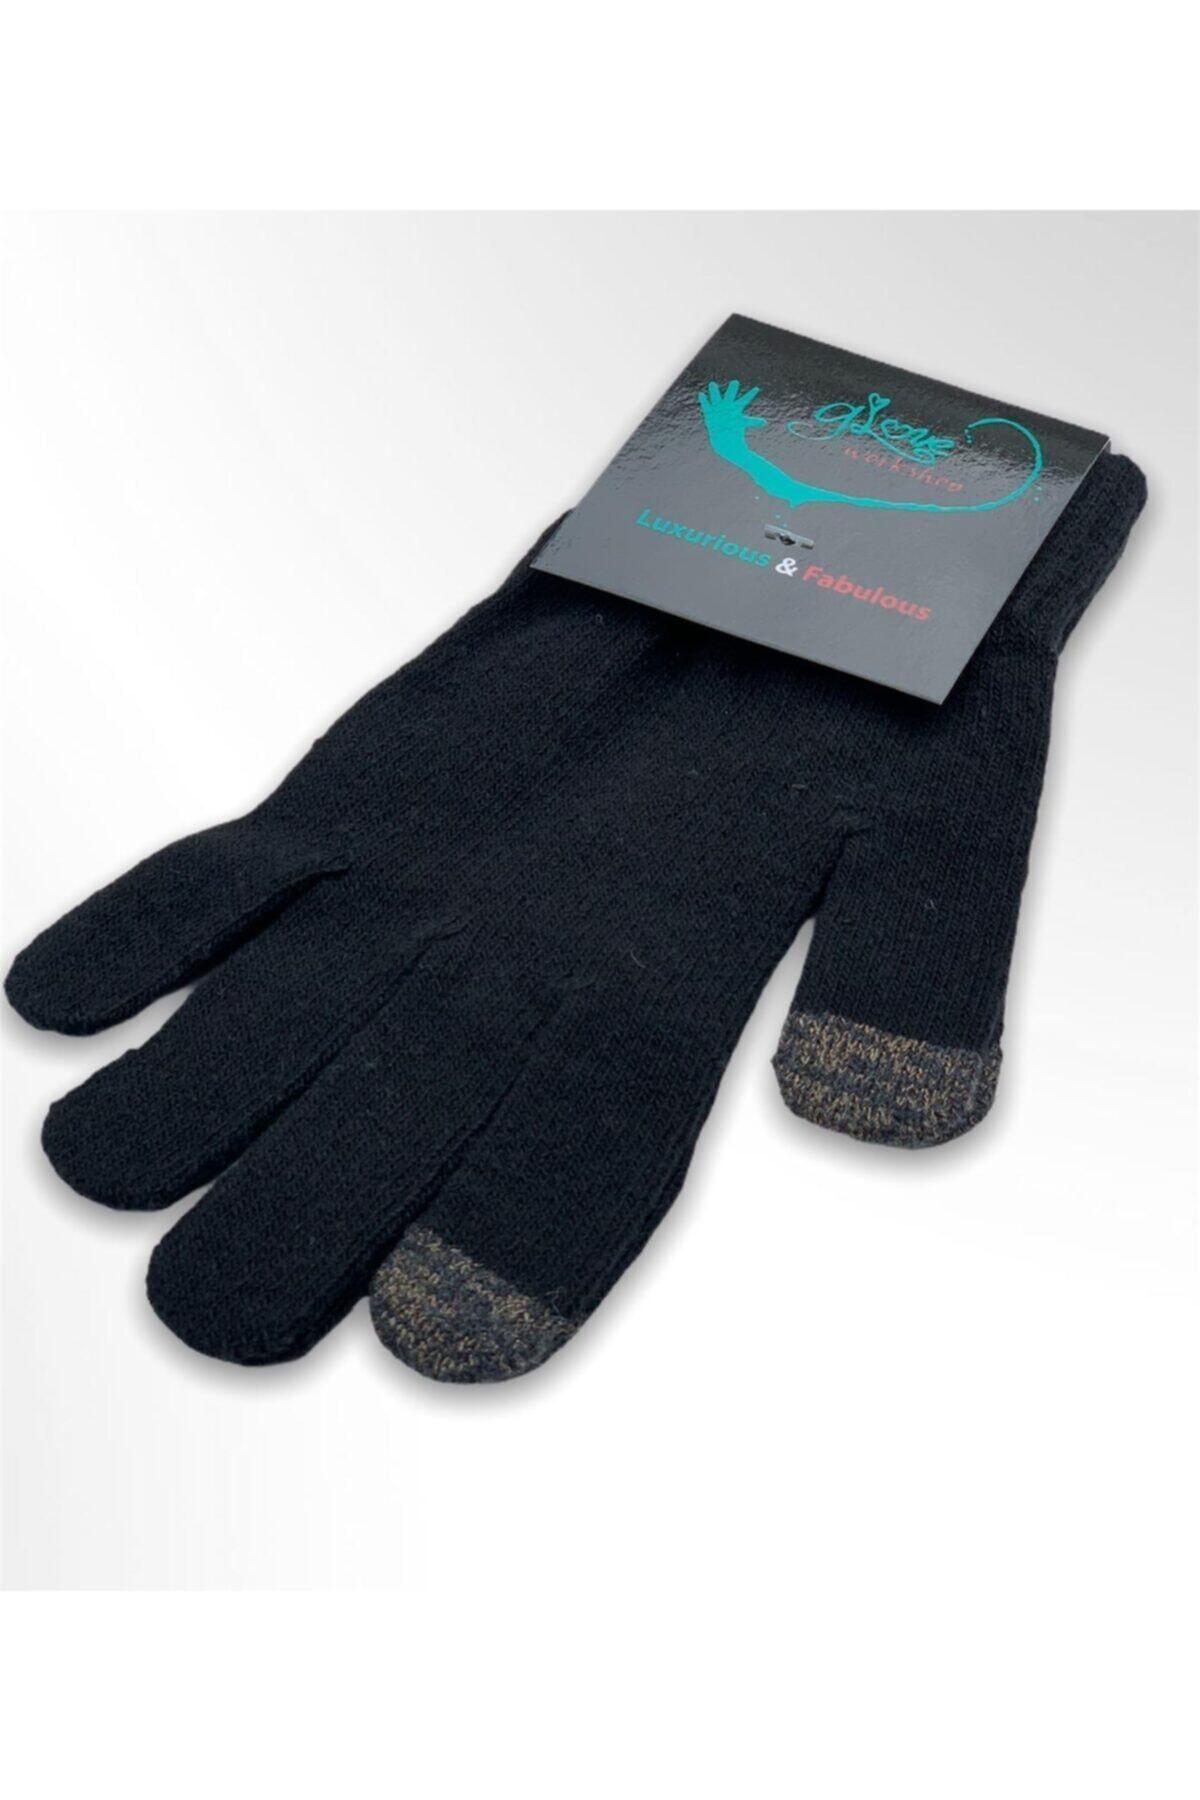 Glove workshop Unisex Siyah Düz Dokunmatik Ekran Eldiven 1